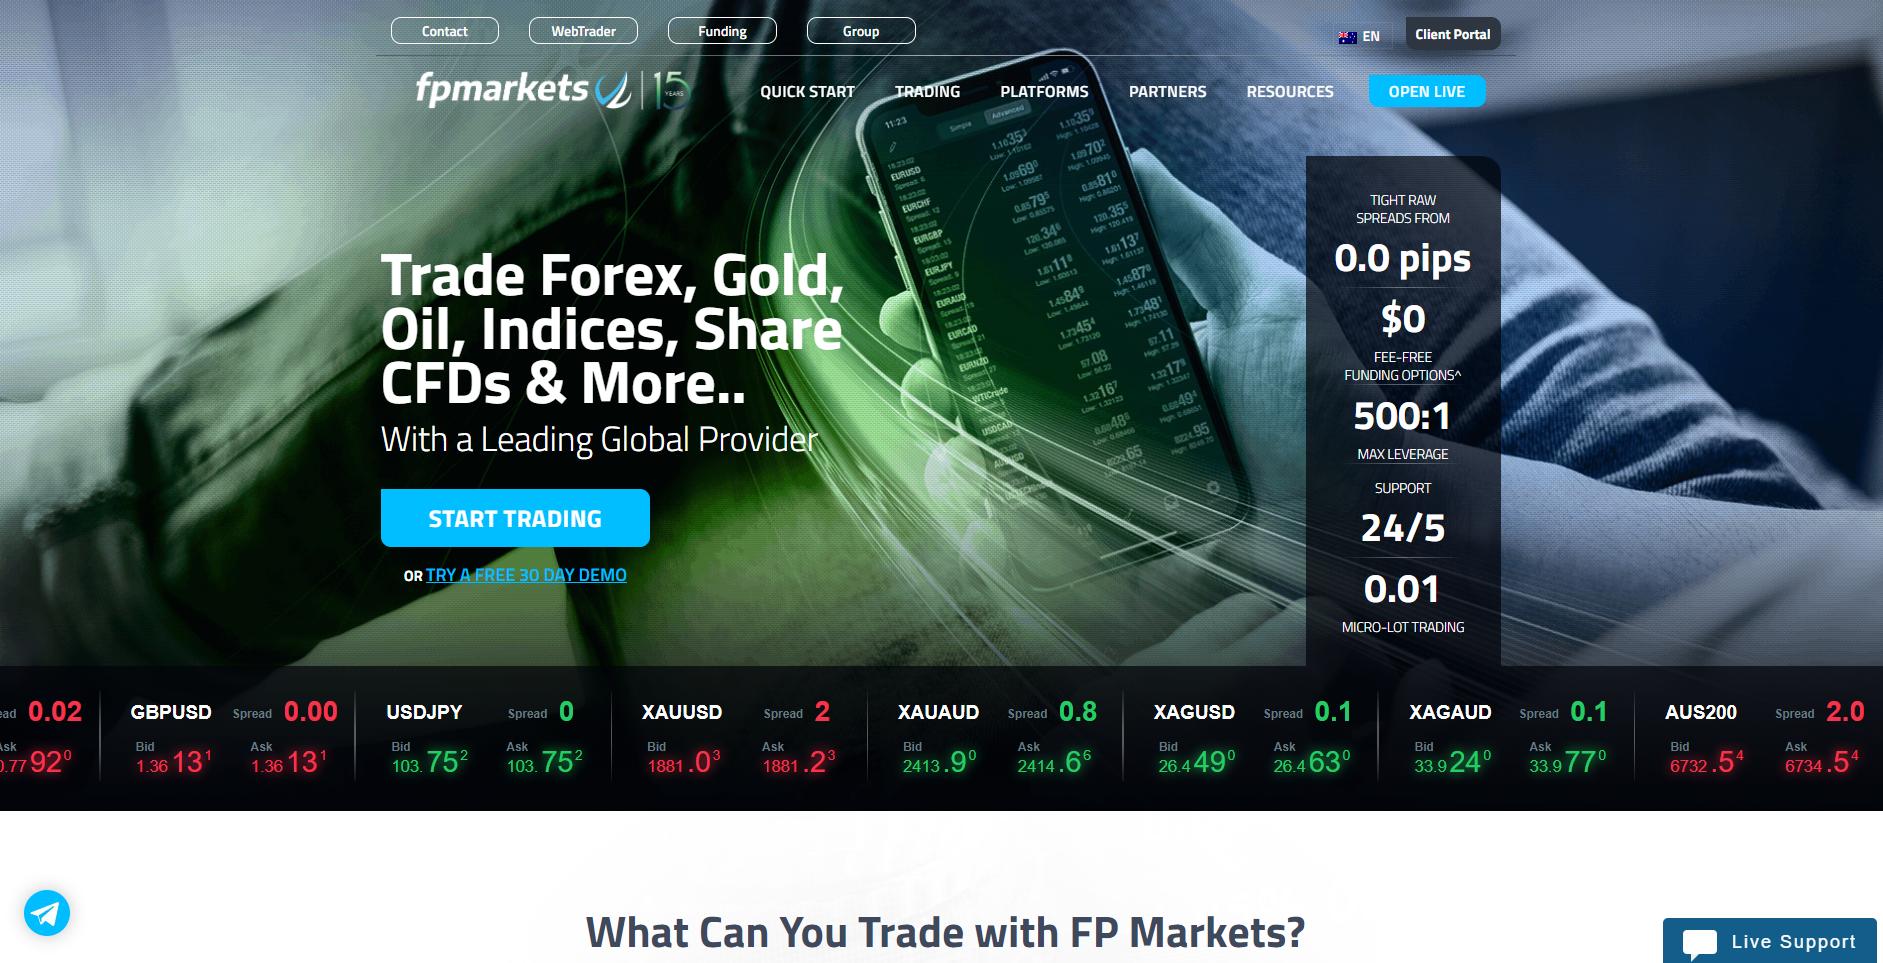 Official website of FP Markets